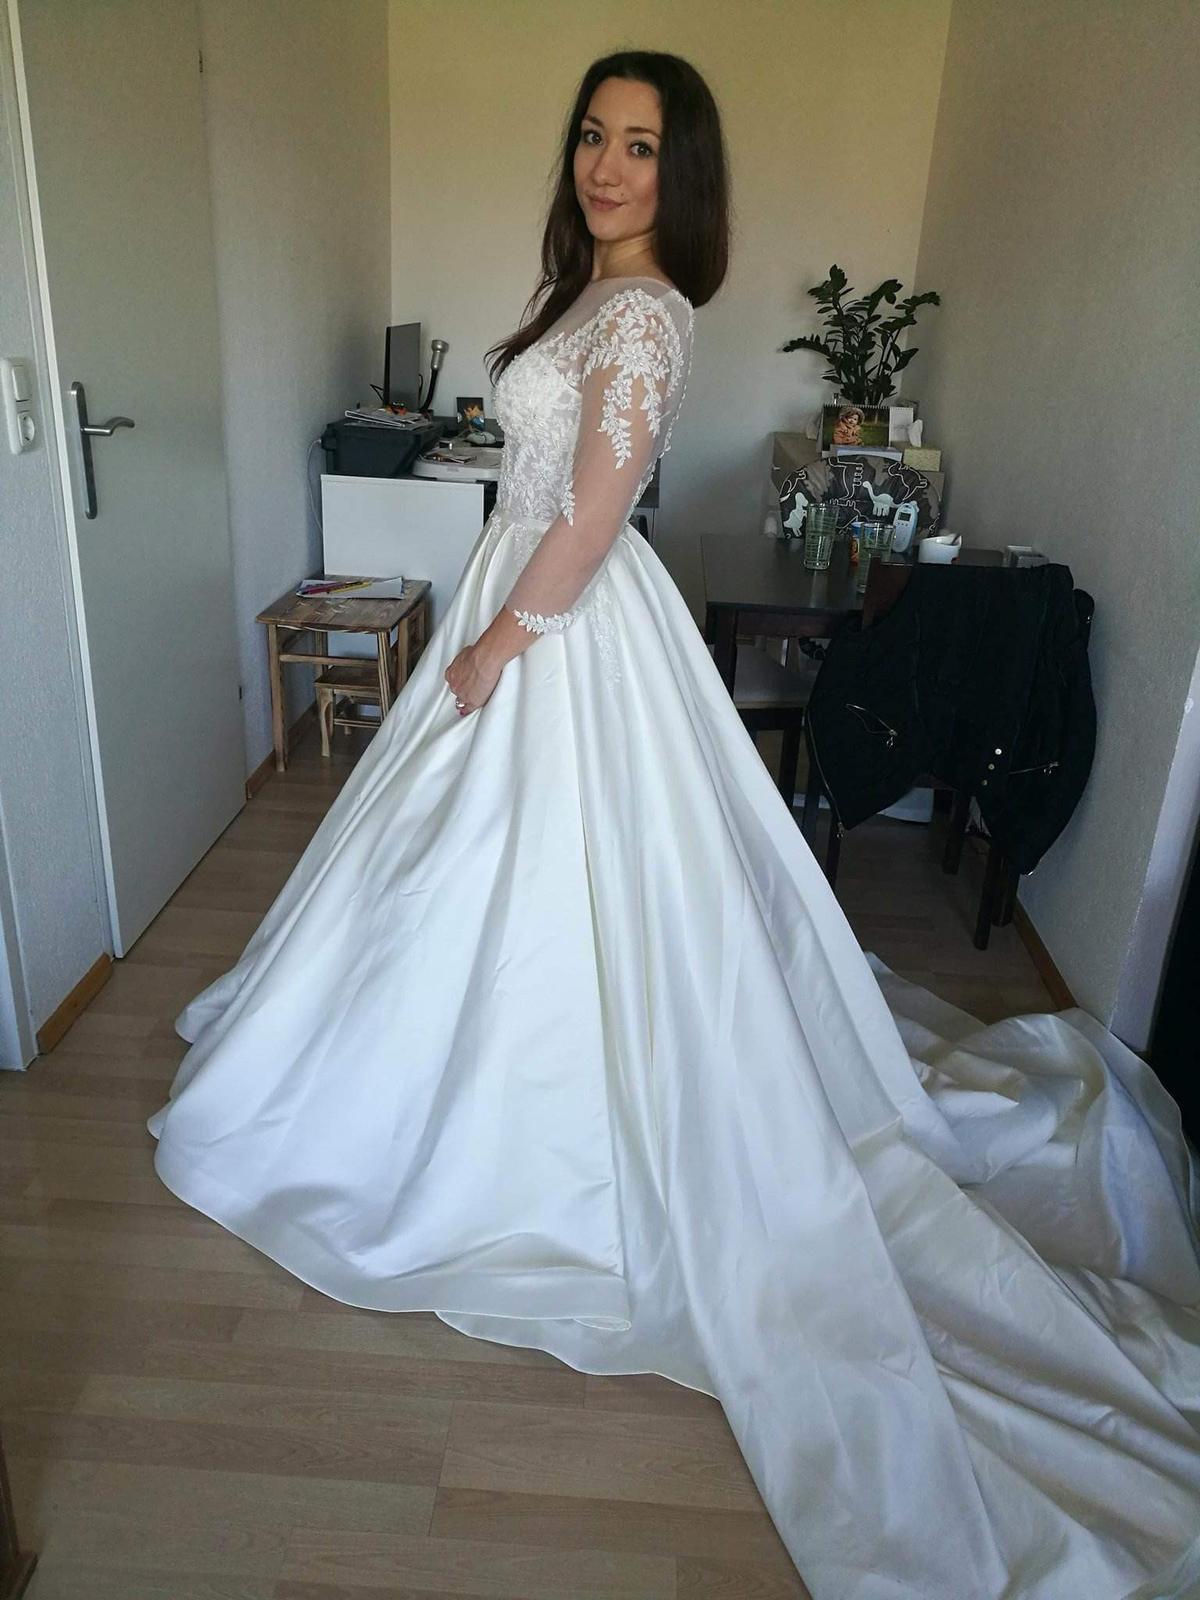 Svatebni Saty Znacky Bridal Crystal 36 38 38 16 500 Kc Svatebni